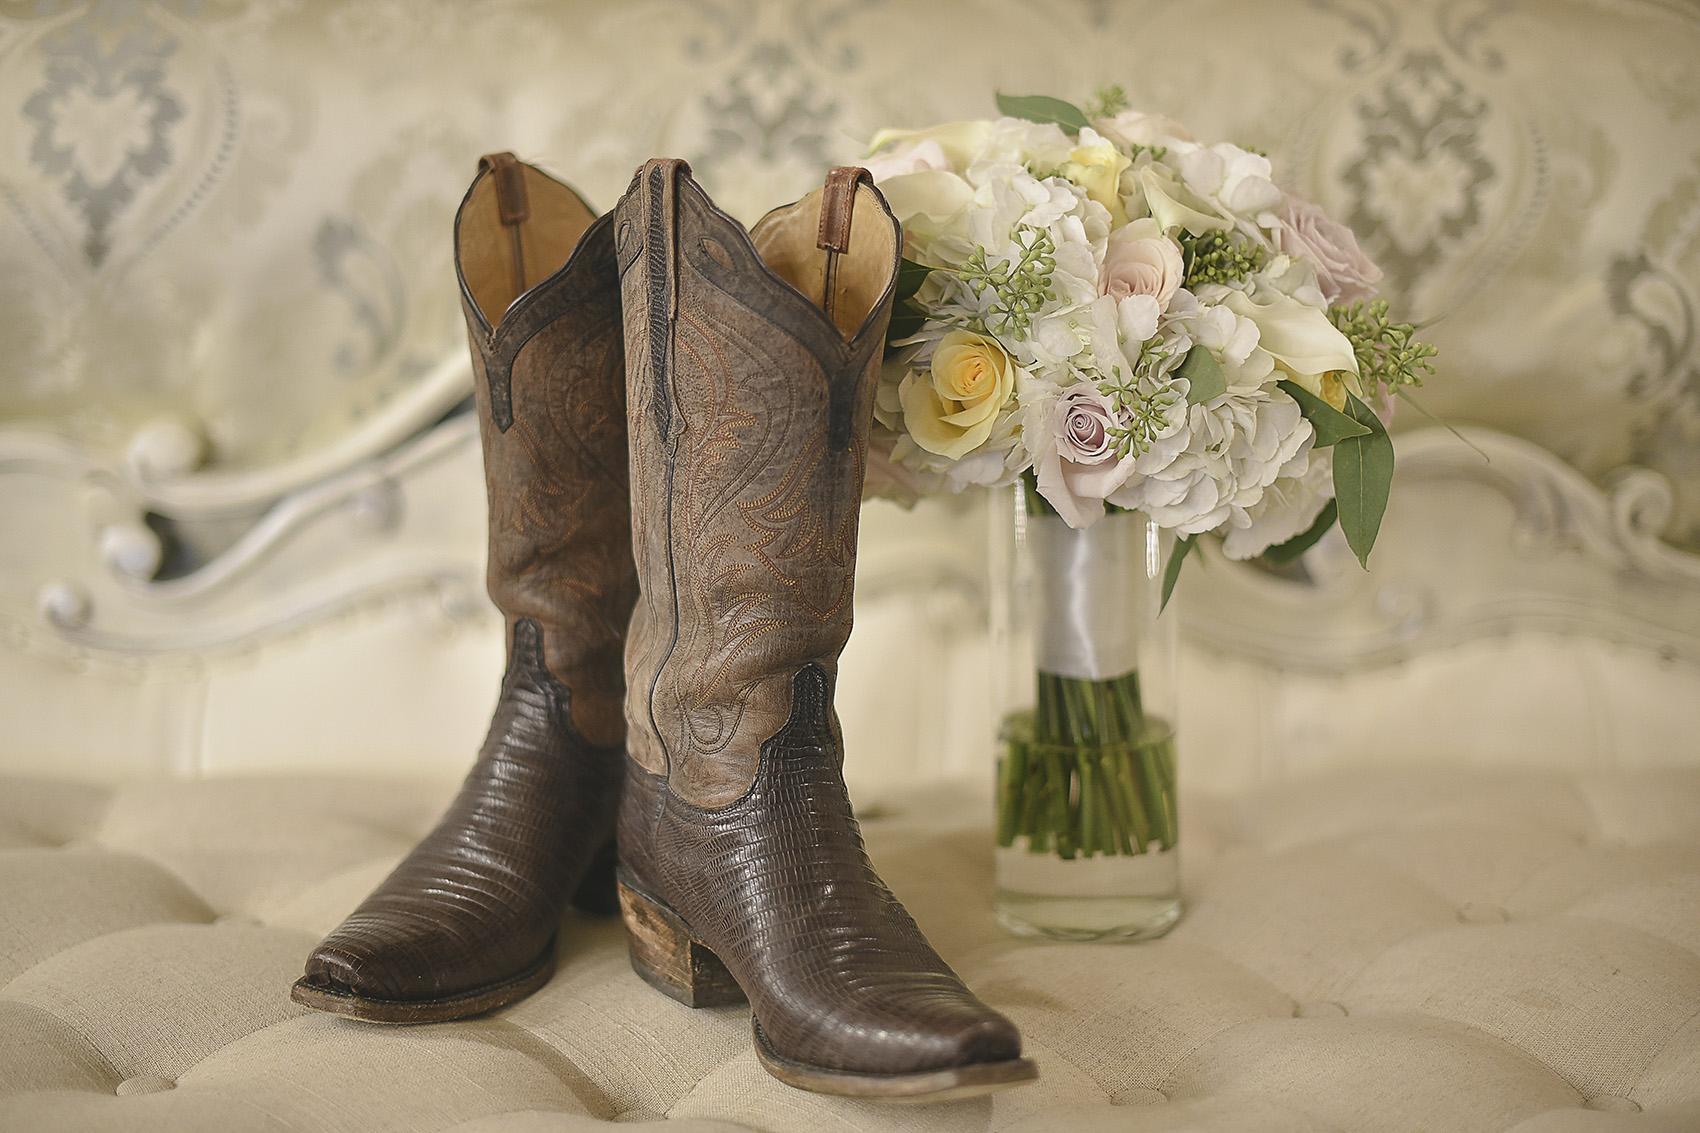 tomball-houston-moffitt-oaks-wedding-boots-flowers-photography